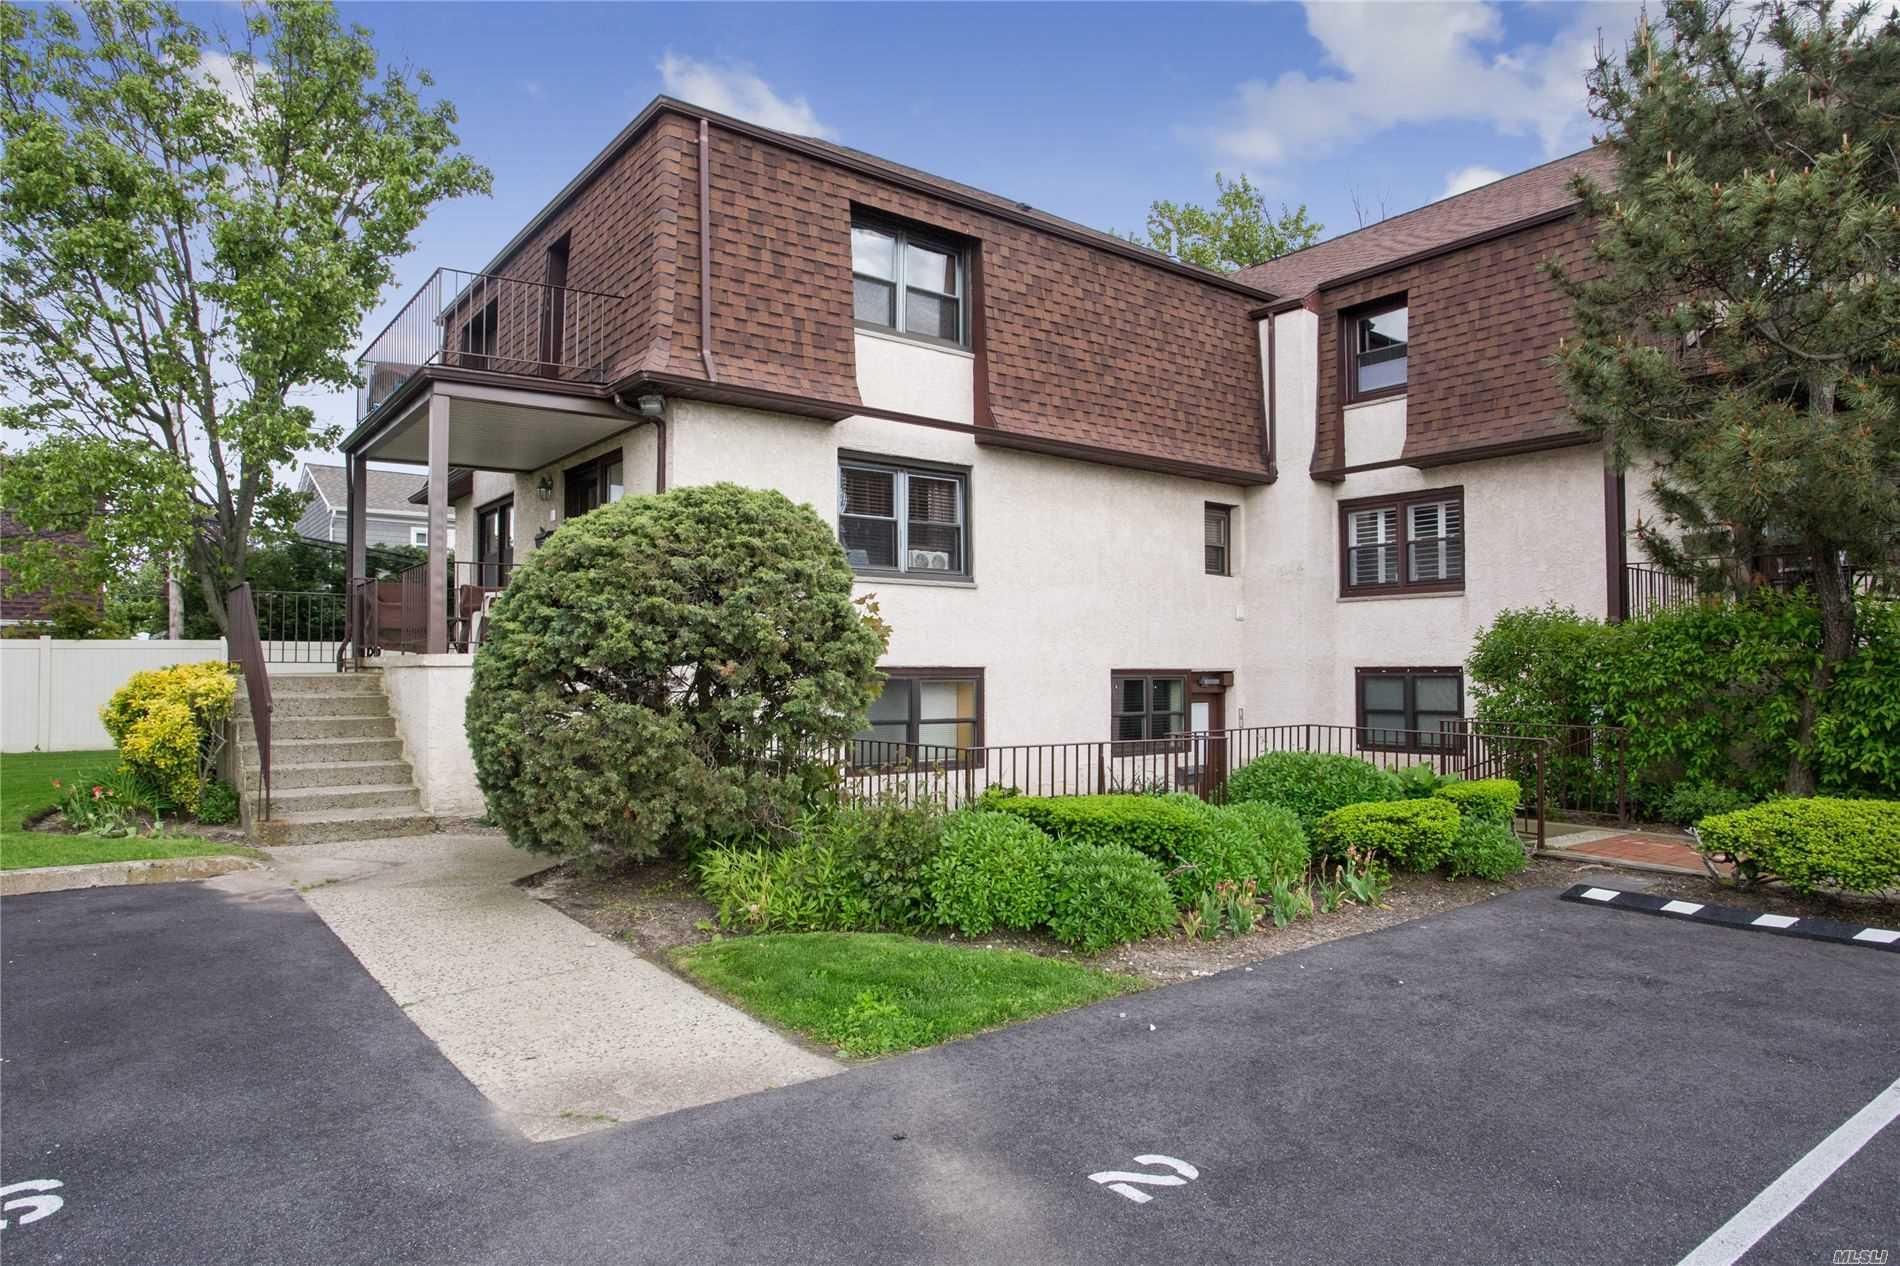 Property for sale at 116 Albany Boulevard # 2B, Atlantic Beach NY 11509, Atlantic Beach,  New York 11509